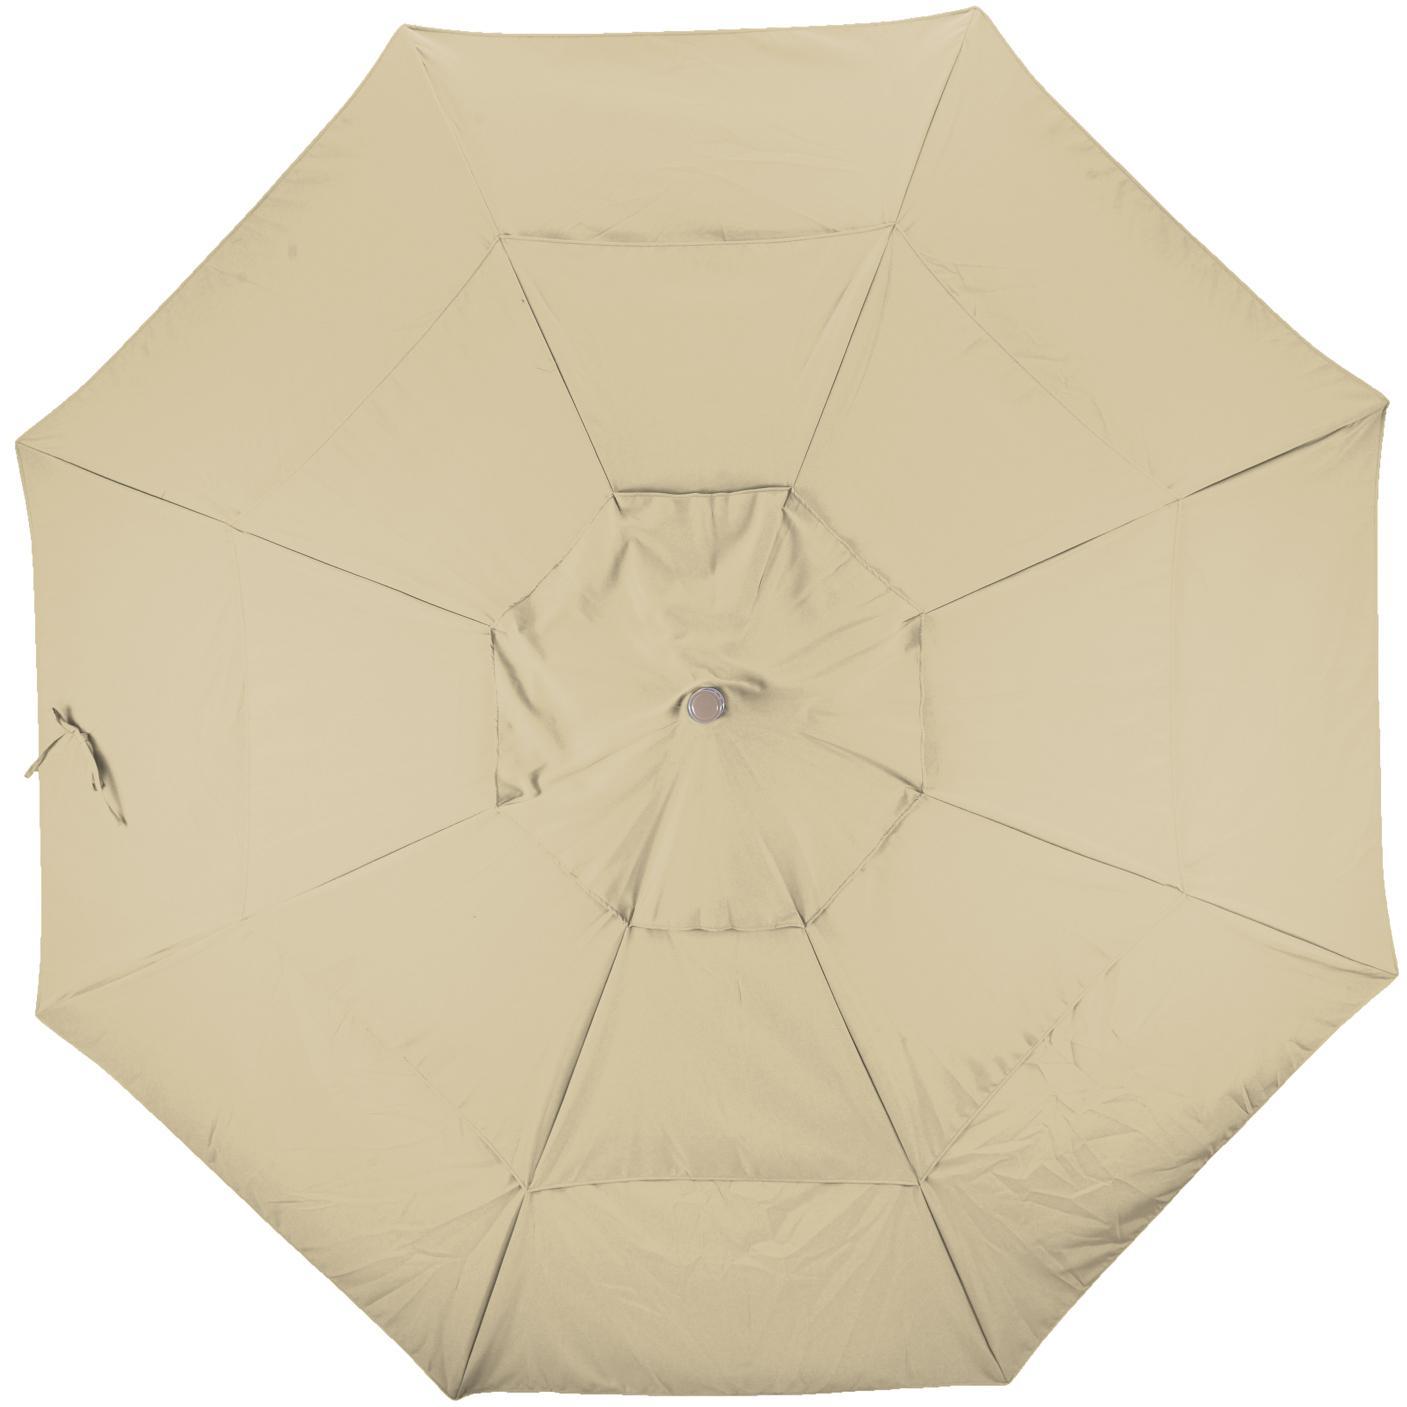 California Umbrella Sunbrella A Fabric In Antique Beige 2909534